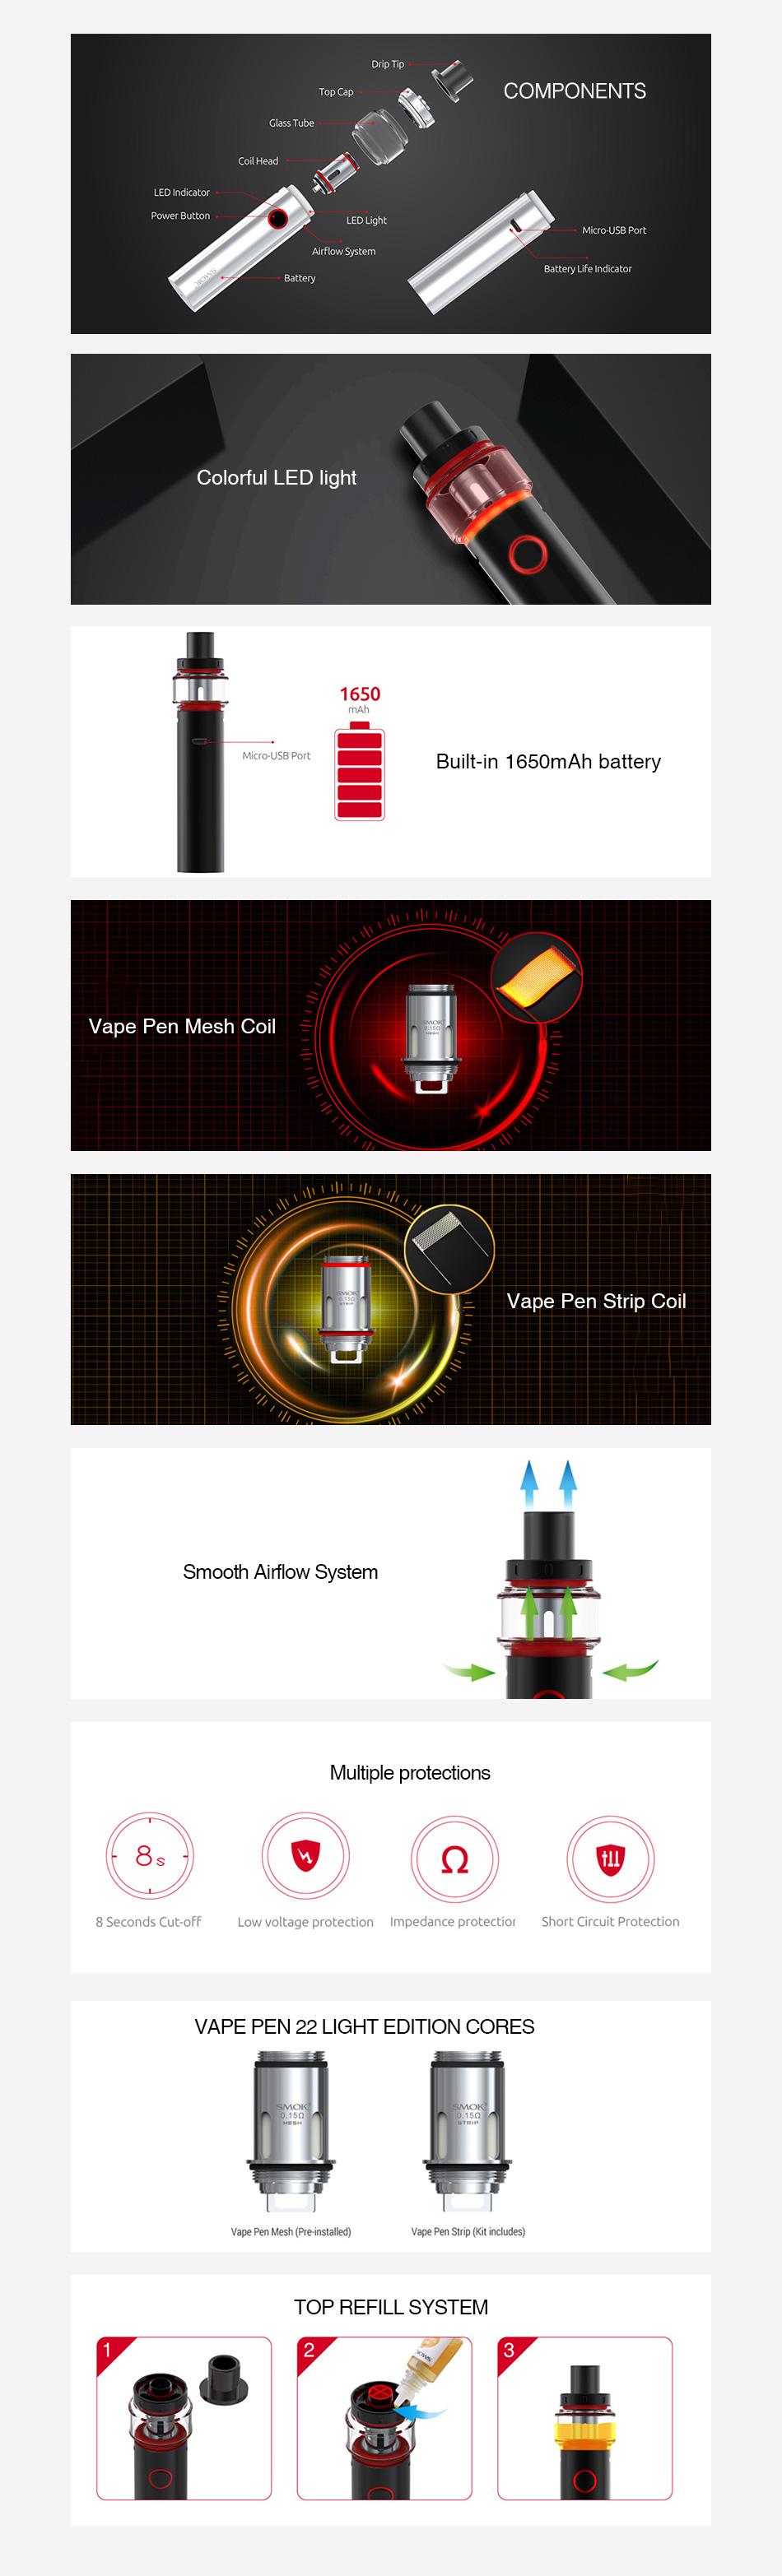 , Original Smok Vape Pen 22 Starter Kit Light Edition w/ 1650mAh Battery & 4ml Tank Vape Pen Kit Vape Kit Vs Smok Novo / Stick V8